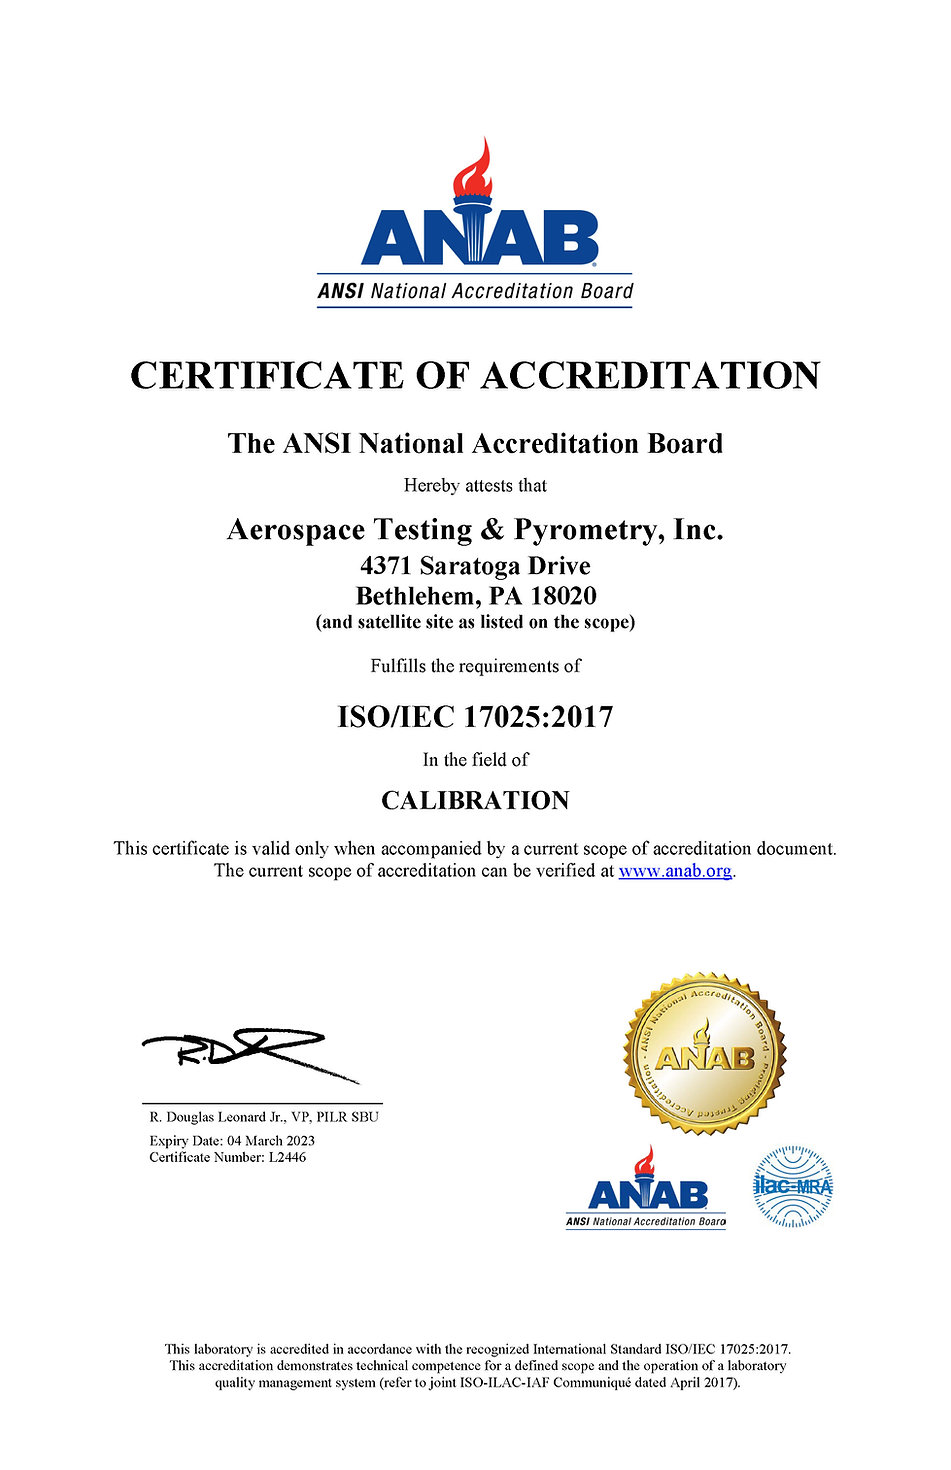 AerospaceTestingPyrometryCertificate.jpg